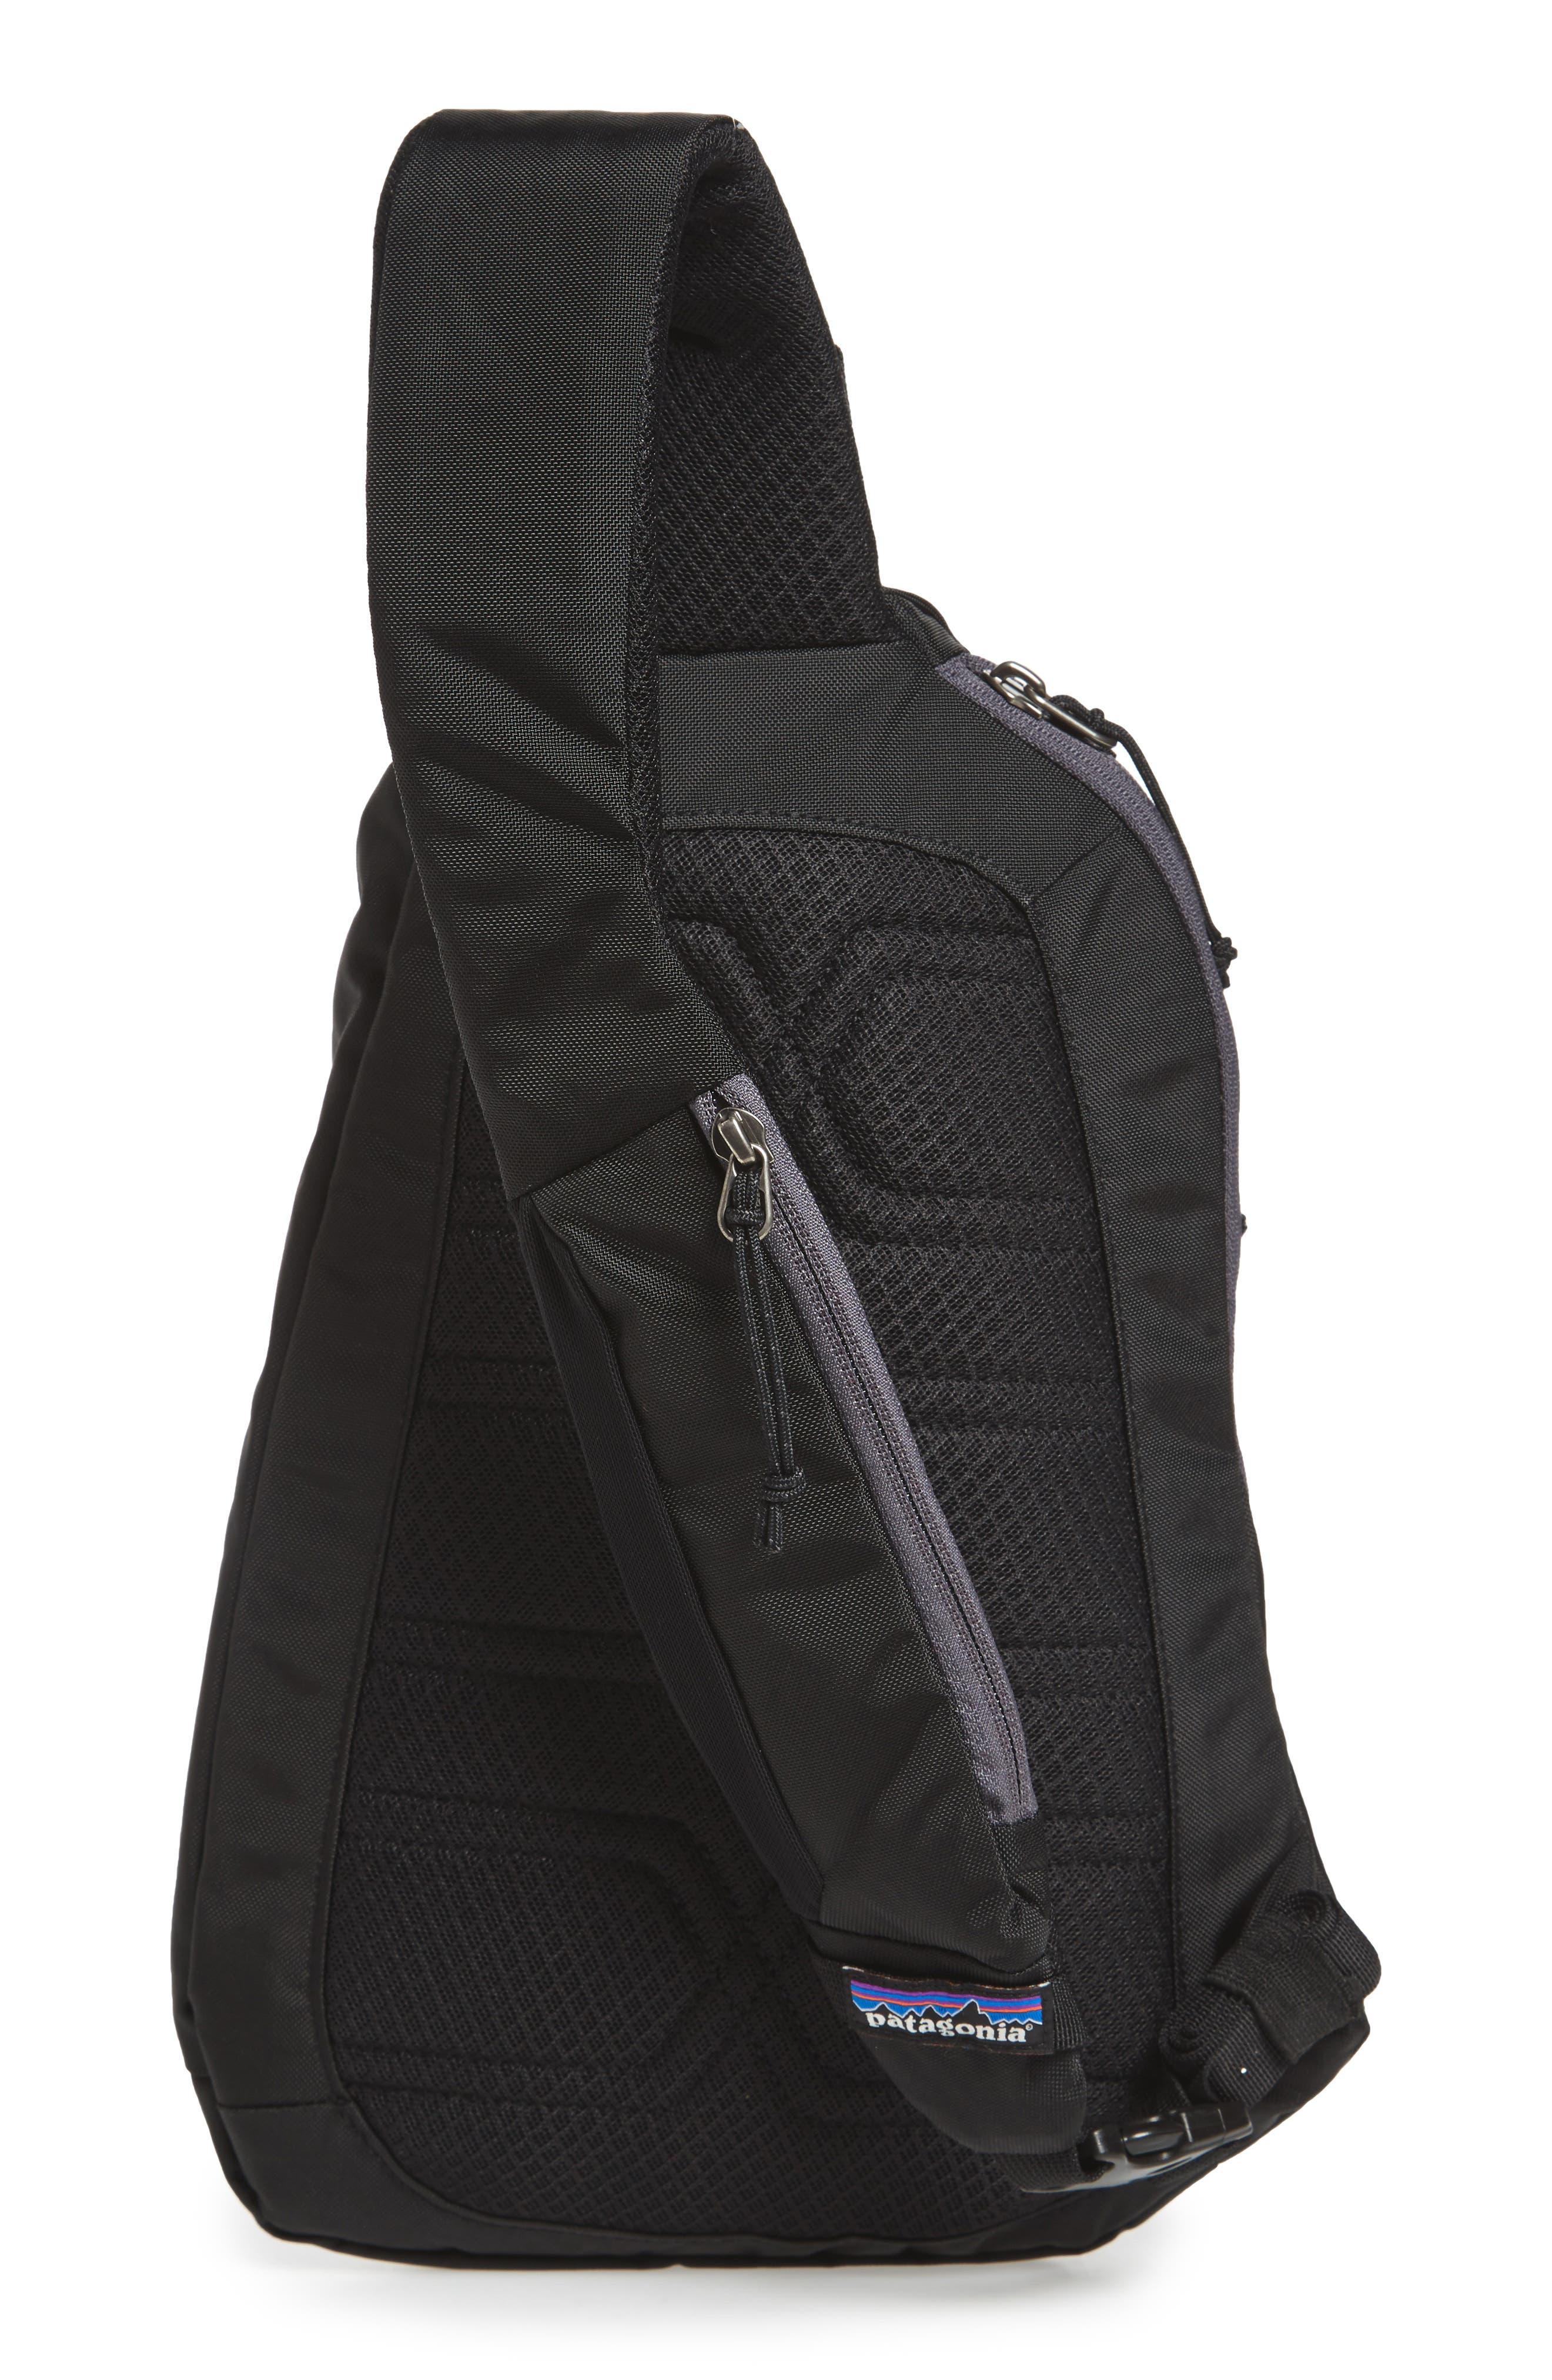 PATAGONIA, Atom 8L Sling Backpack, Alternate thumbnail 4, color, BLACK